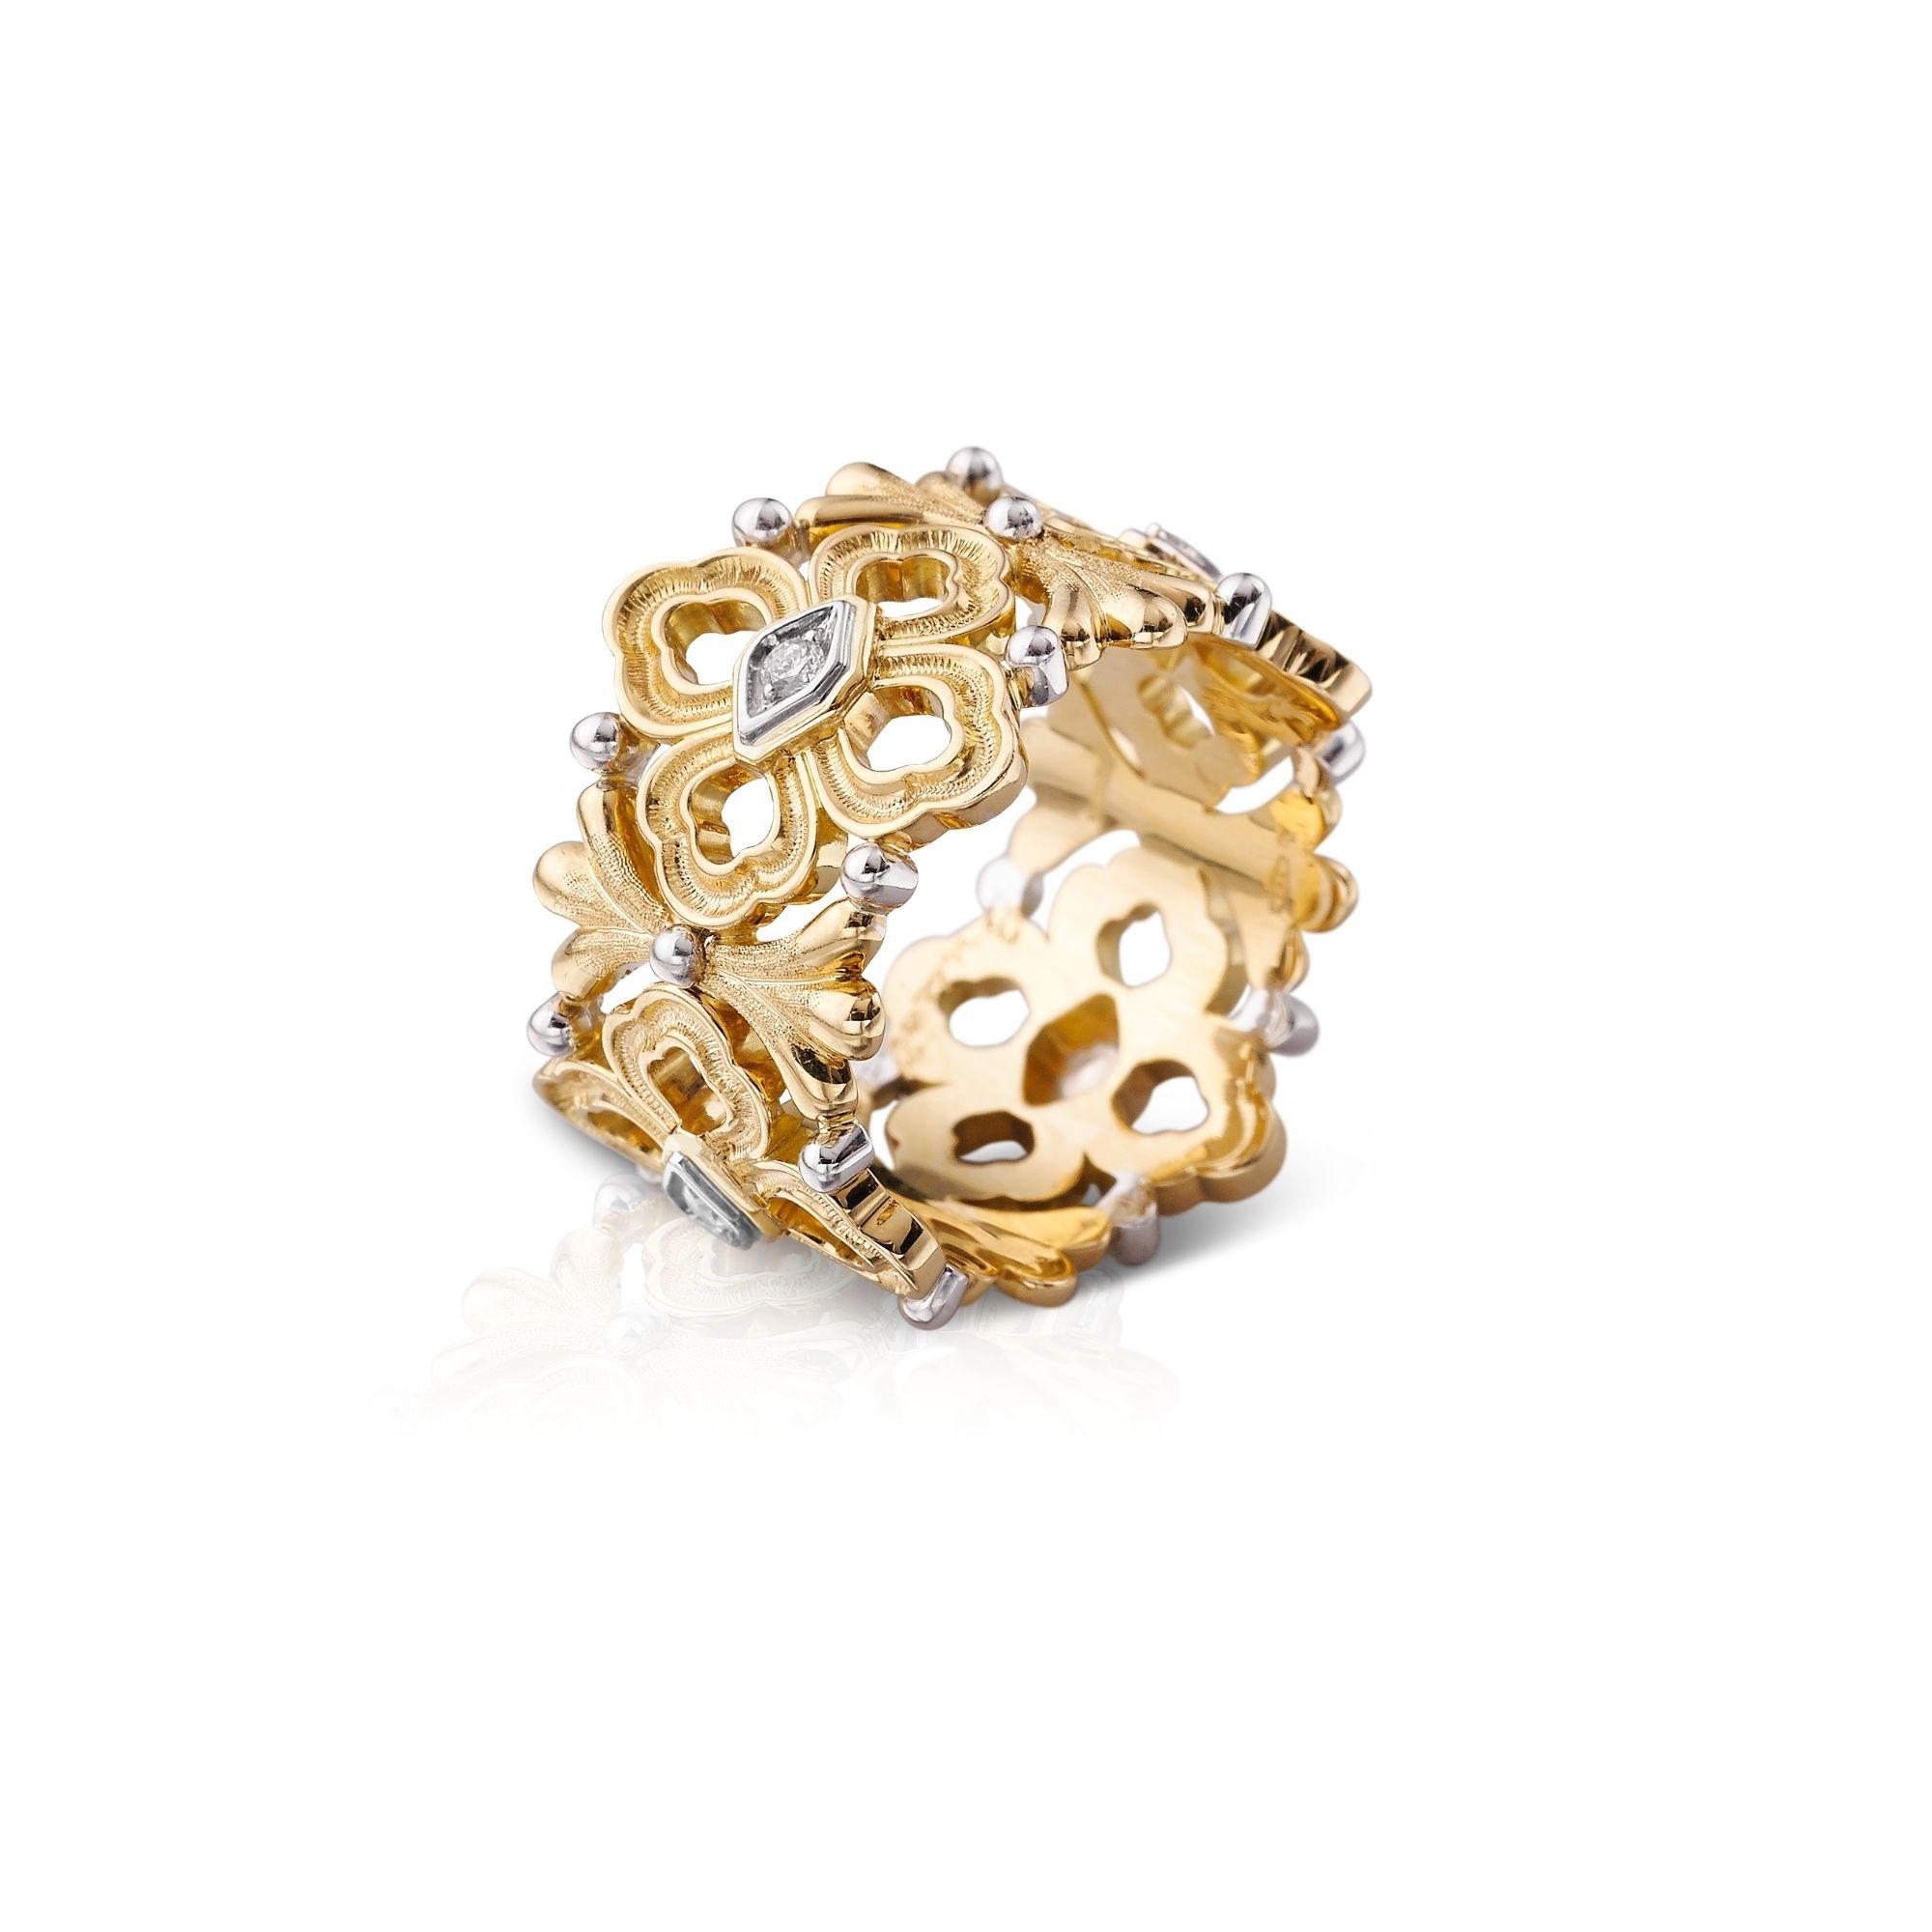 JAUETE009561 anelloopera buccellati ring sconto discount